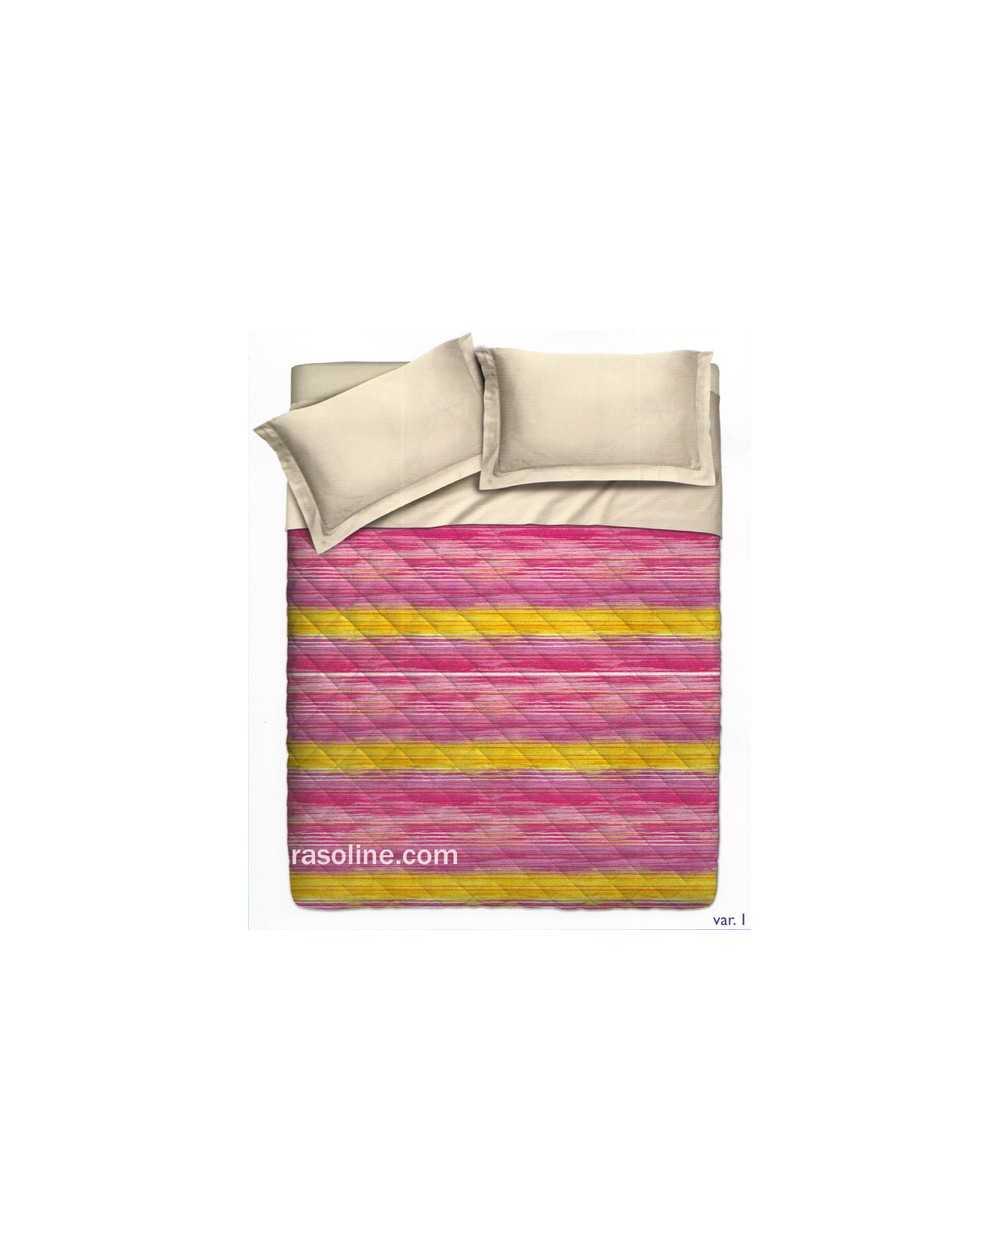 couvre lit matelass carr gf ferrari rose orange mesure una piazza. Black Bedroom Furniture Sets. Home Design Ideas